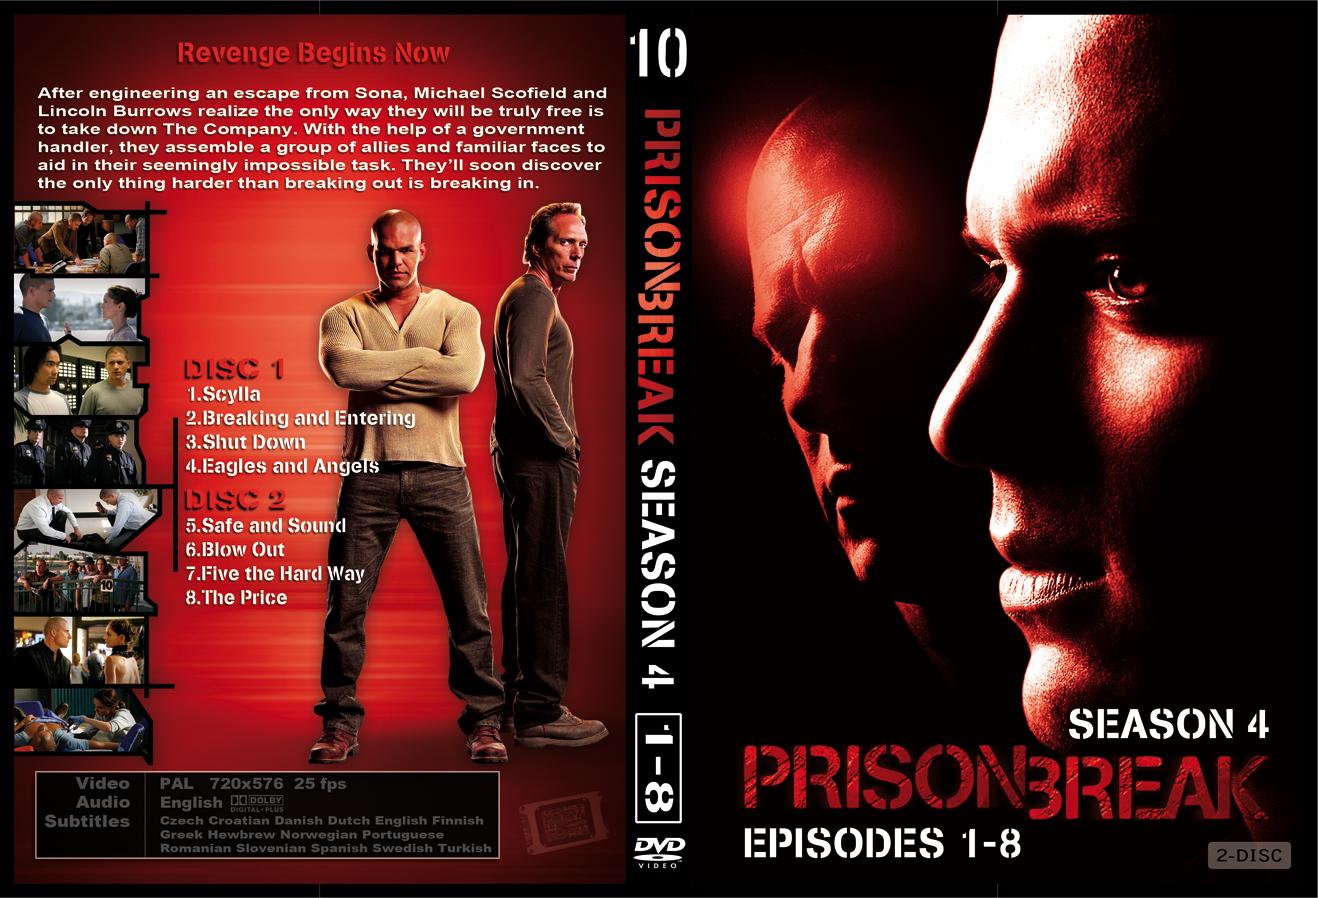 Prison Break Season 4 Cover By Miracol On Deviantart